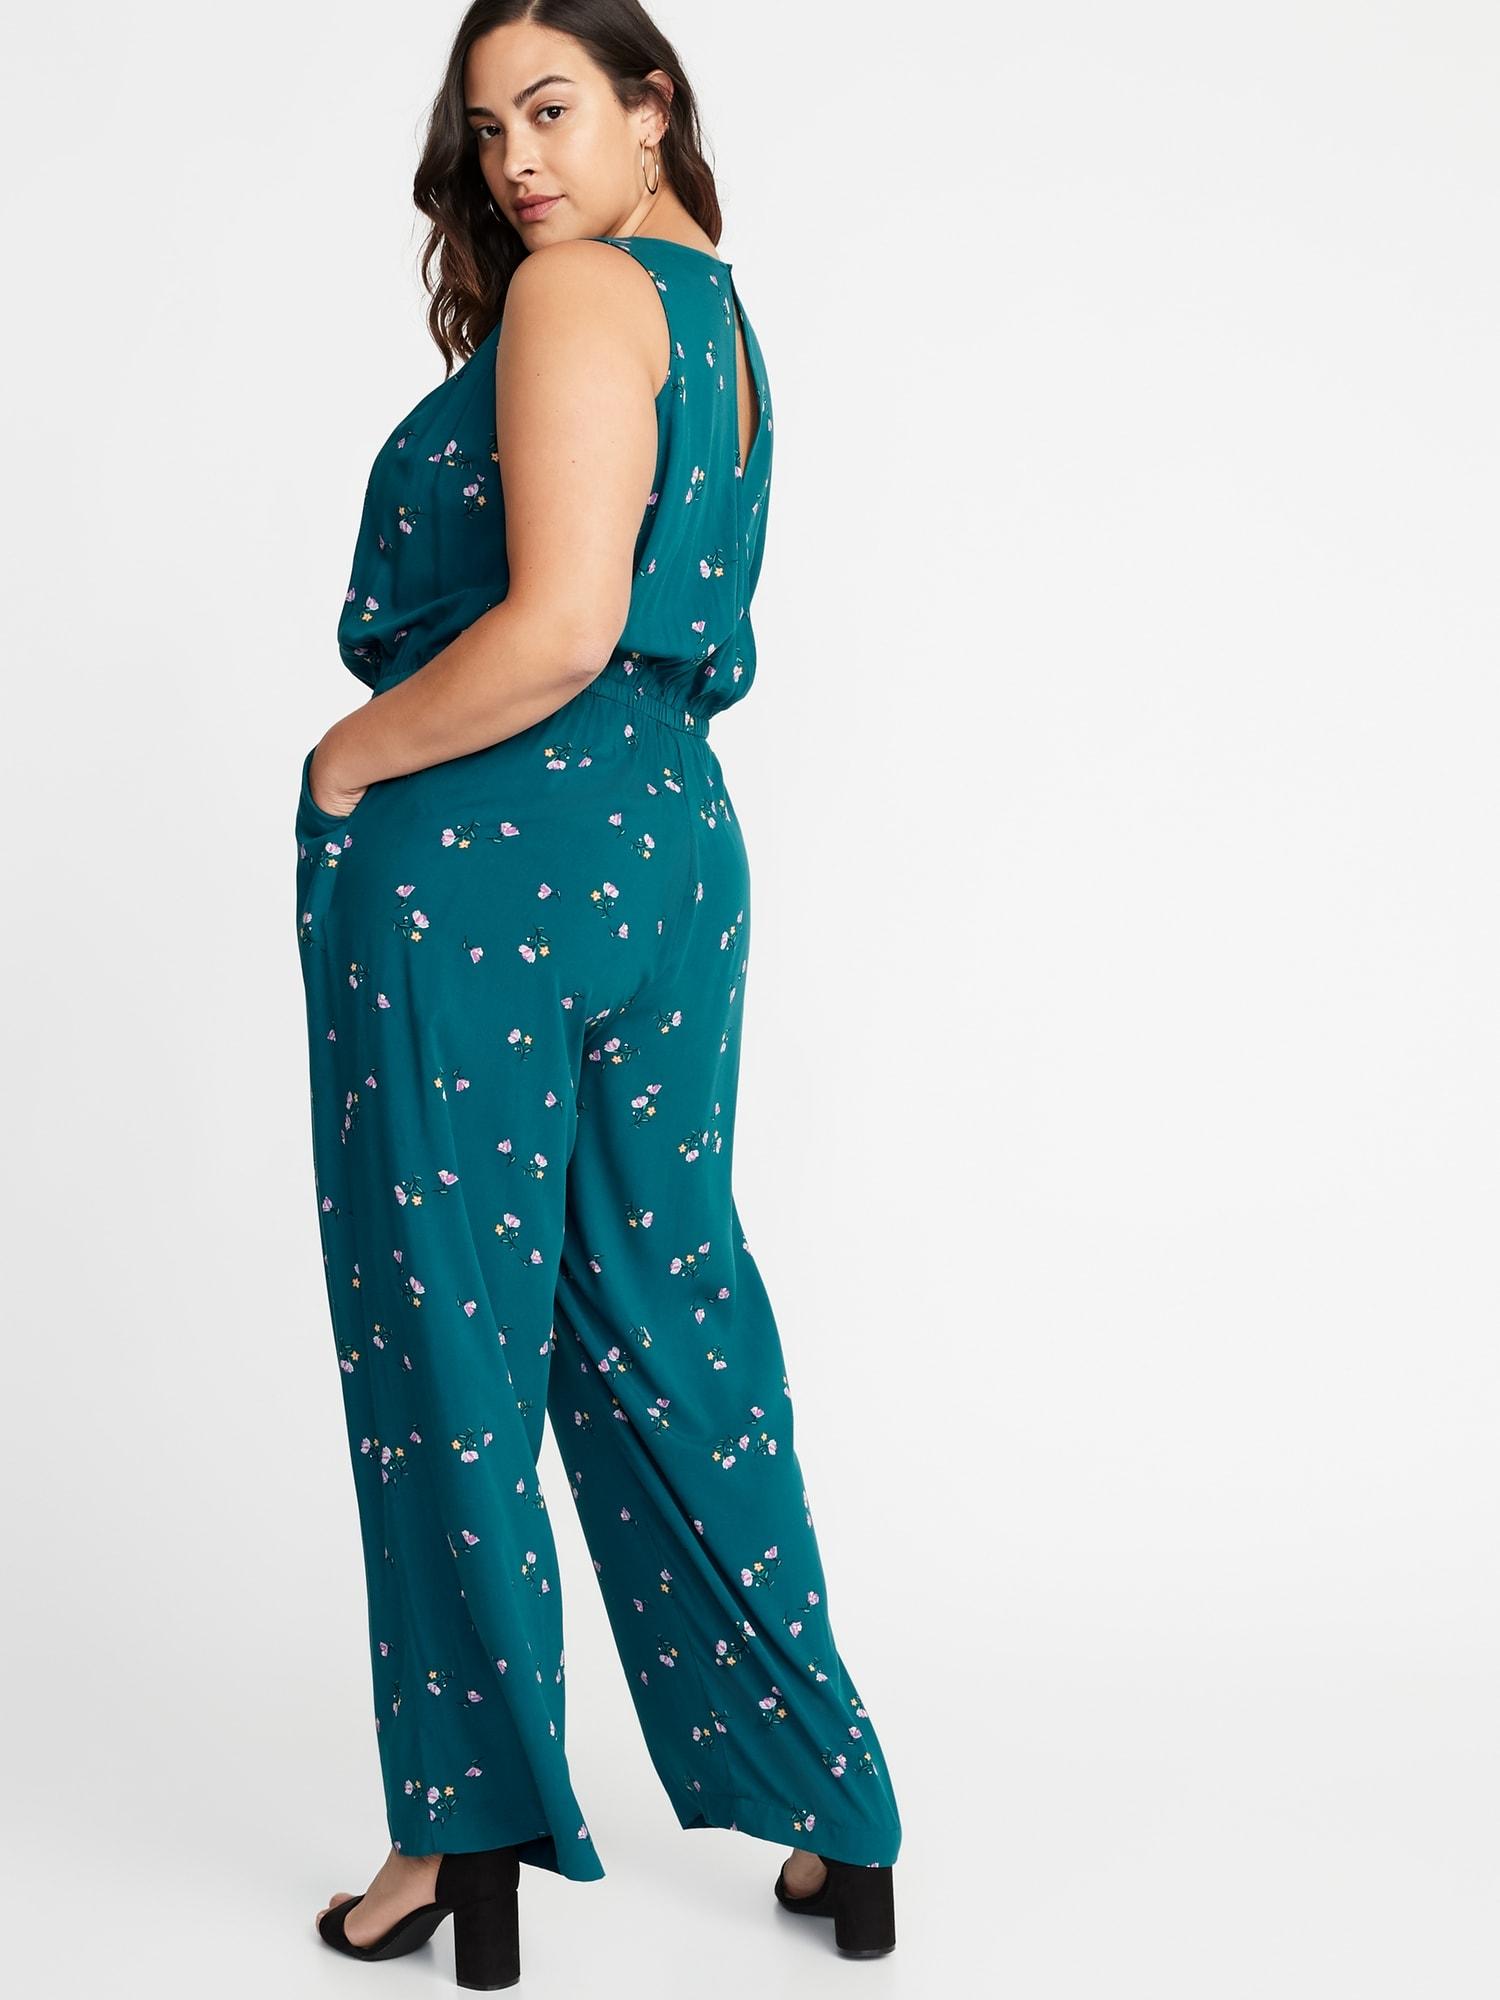 869bde058560 Waist-Defined Plus-Size Sleeveless Jumpsuit